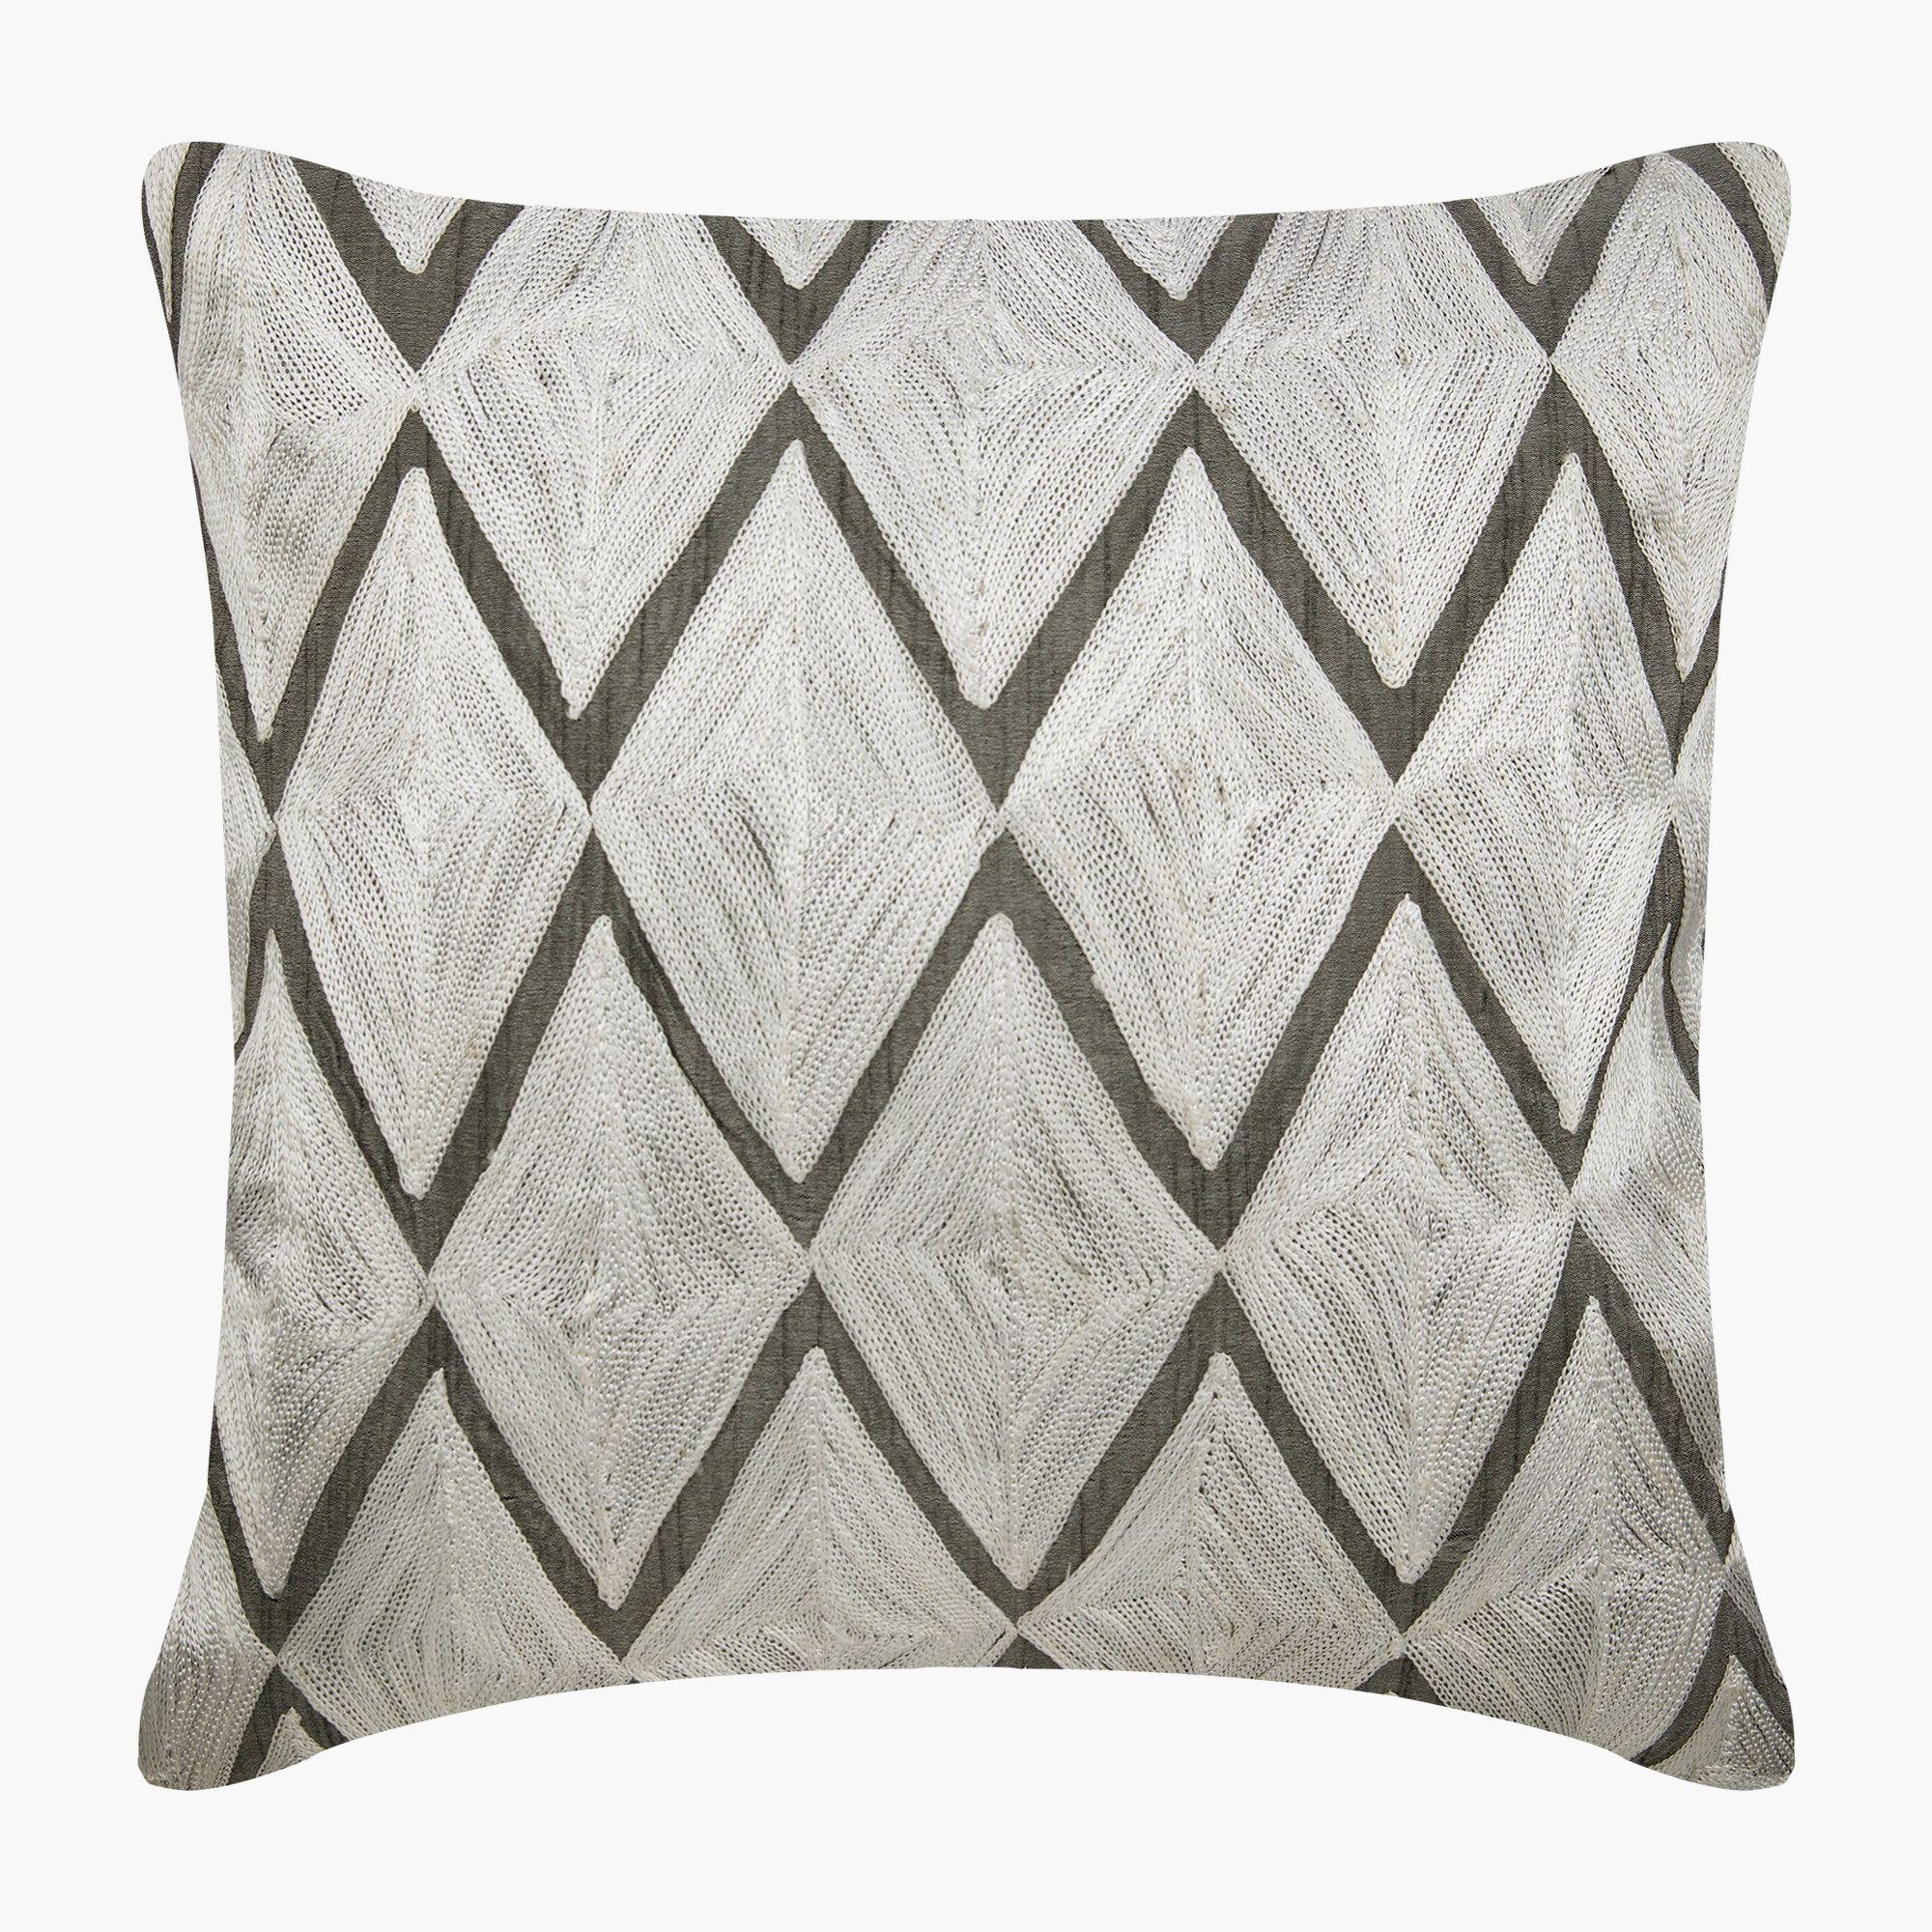 Decorative Charcoal Gray Euro Size Pillow Cover 26 X26 Art Silk Throw Pillow Cover Sofa Throw Large Geometric Modern Style Diamond King Silk Throw Pillows Silk Pillow Cover Throw Pillows